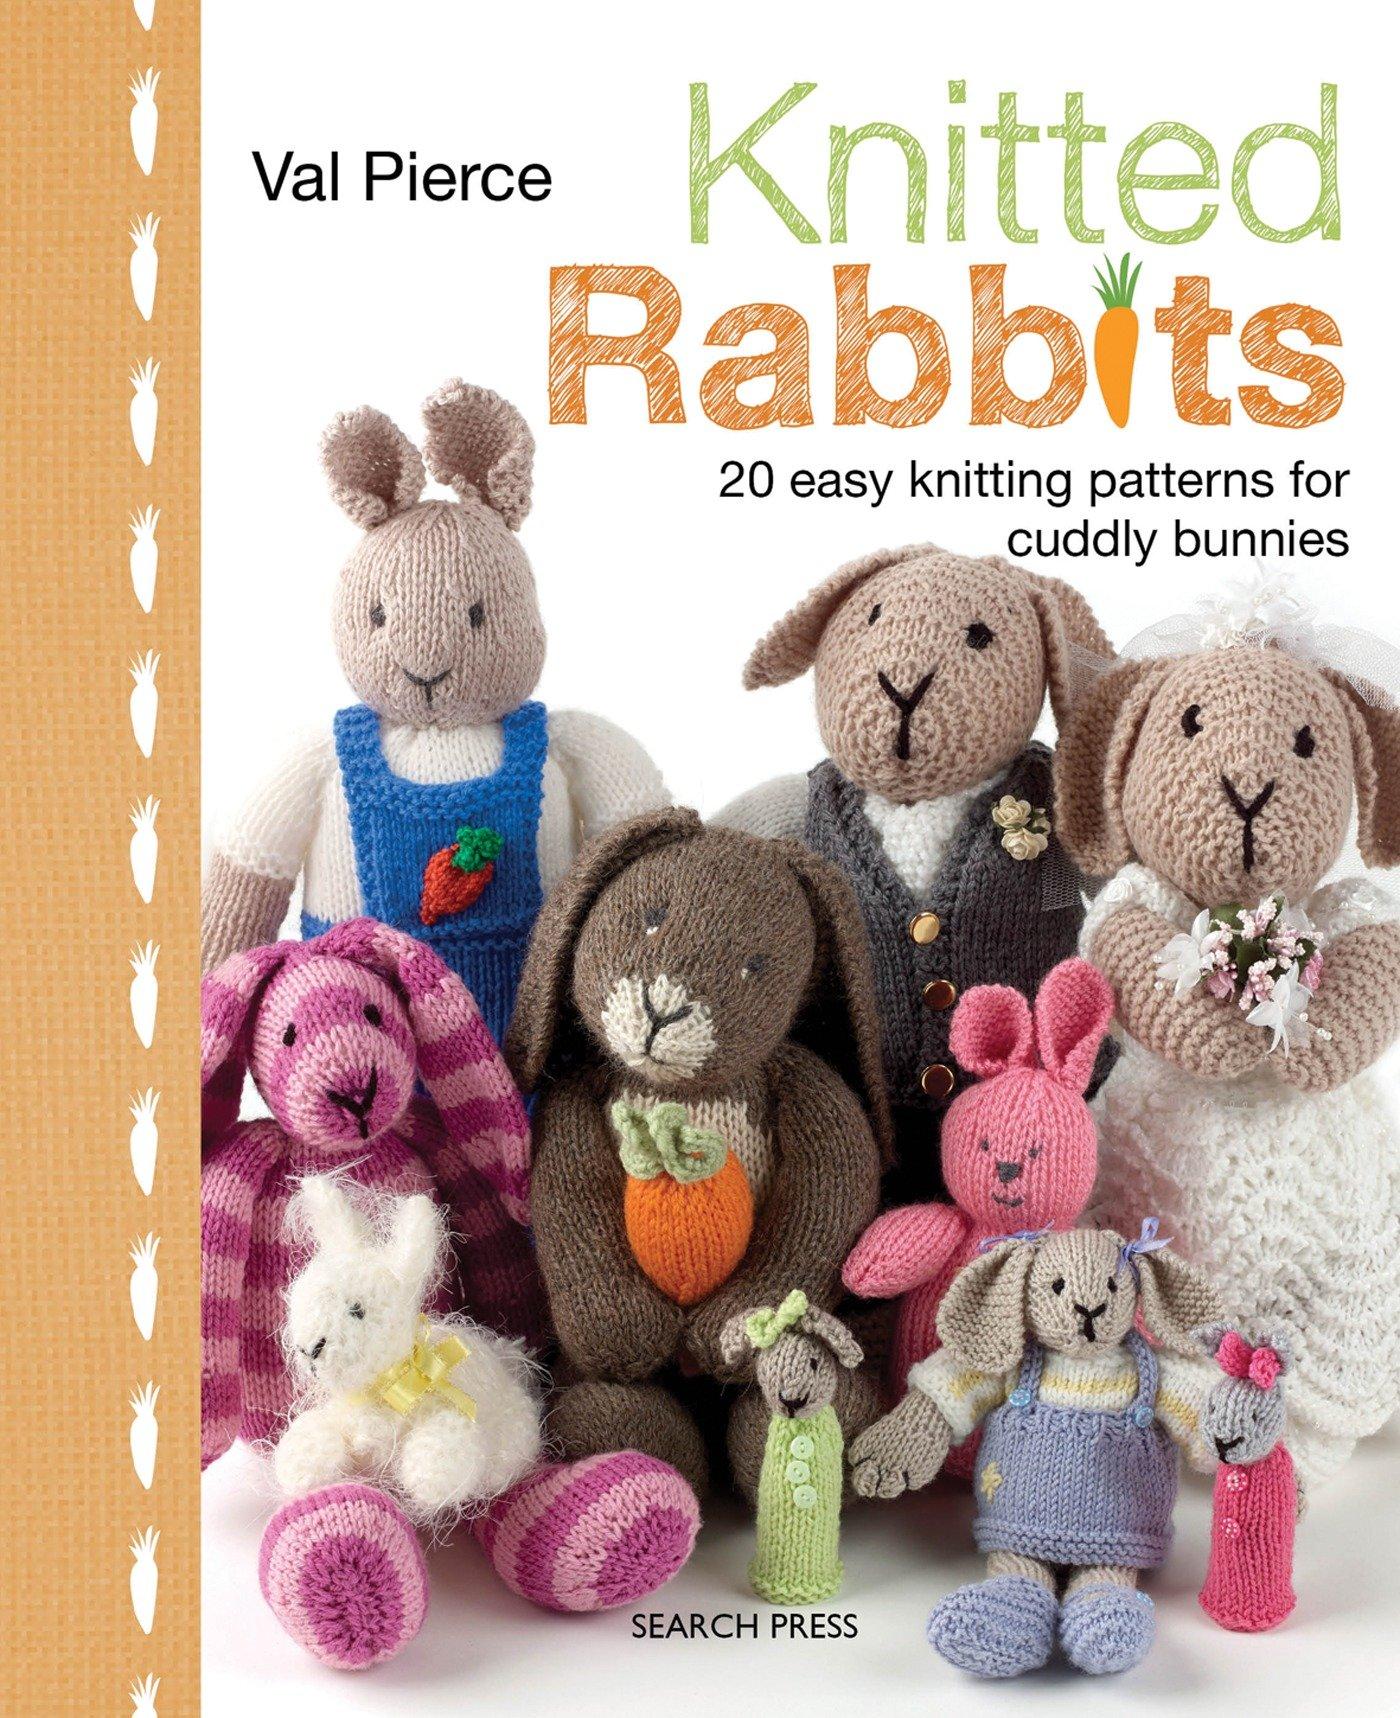 Knitted Rabbits: Amazon.co.uk: Val Pierce: 9781844488674: Books